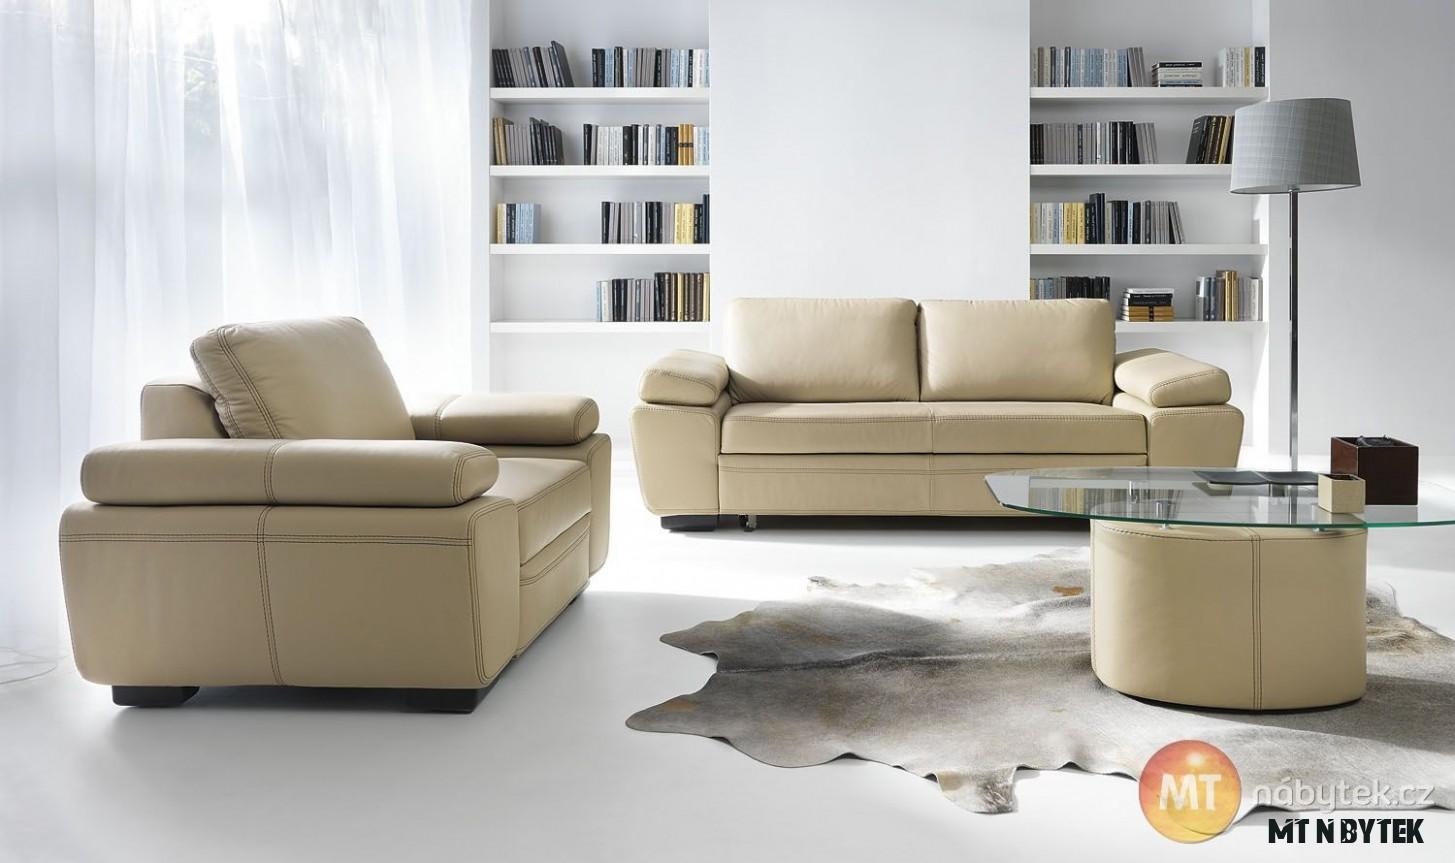 Kožená sedací souprava Medarda 7+7  MT-nábytek #sofa #divan